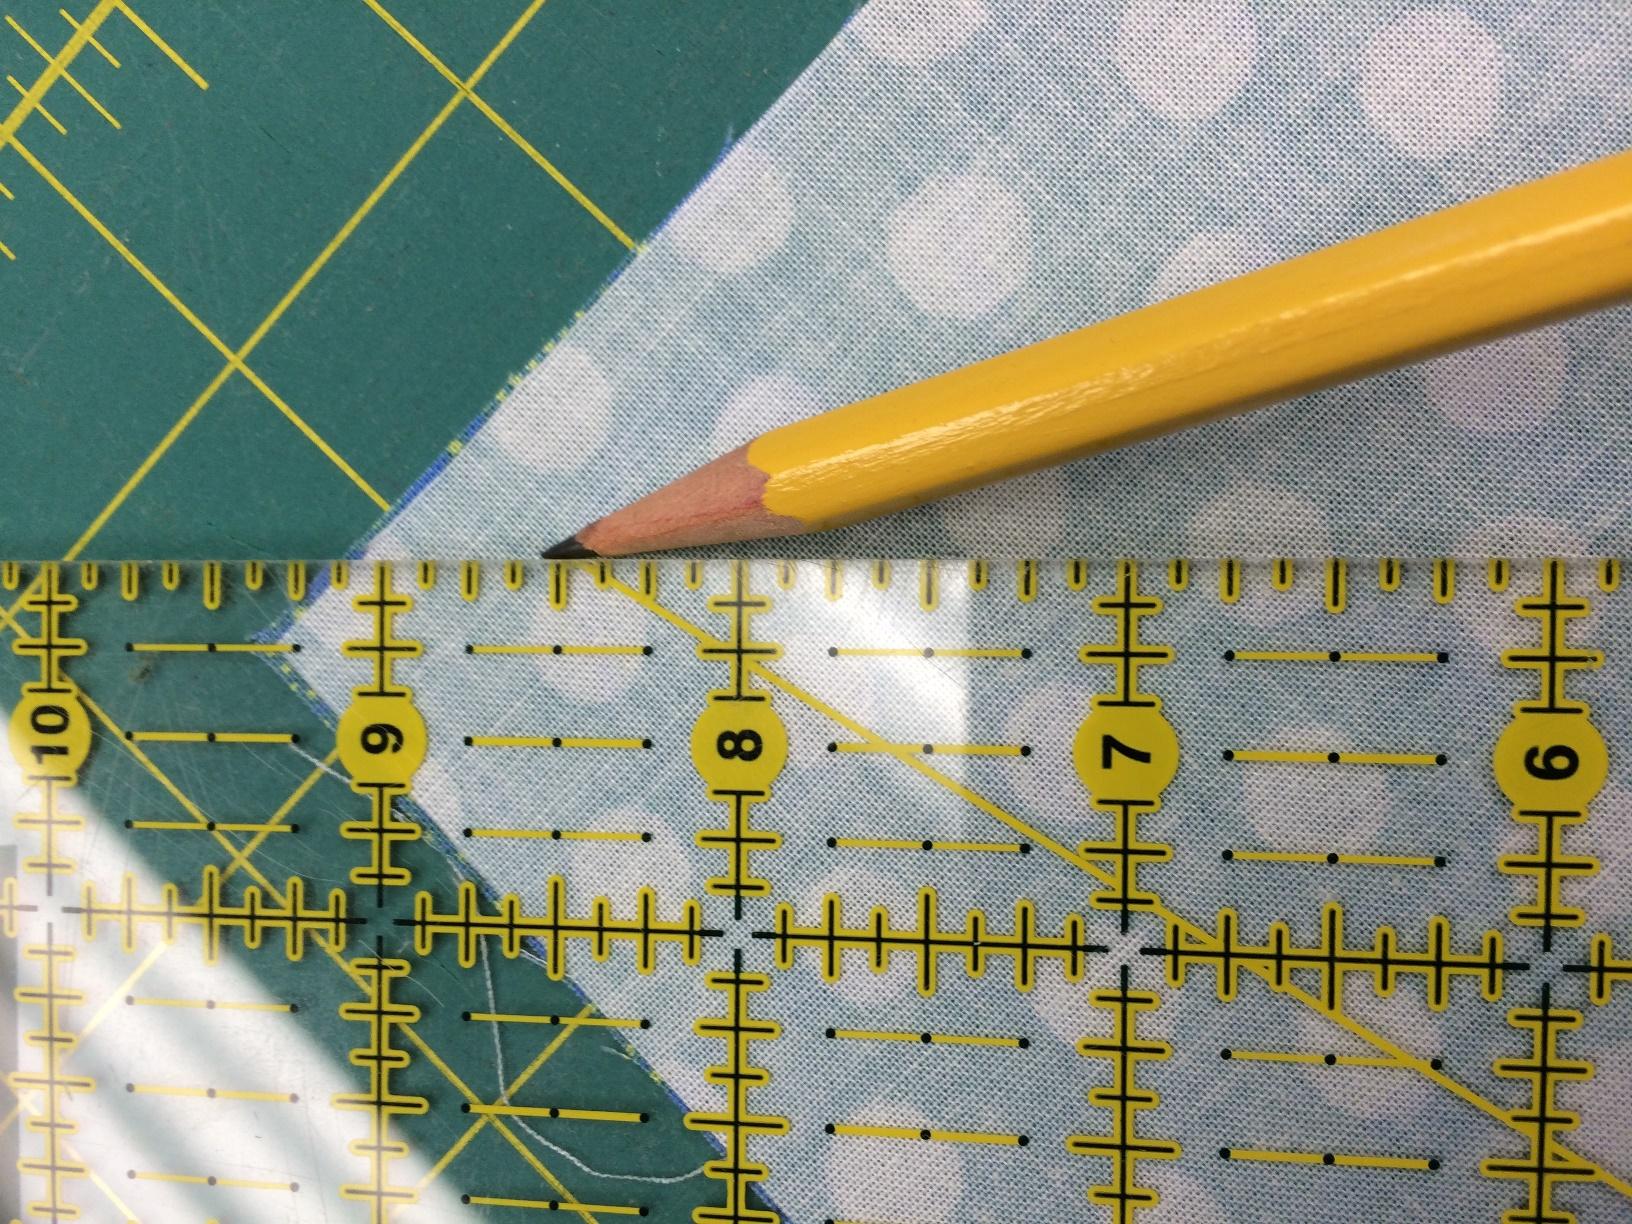 pencil marking on fabric